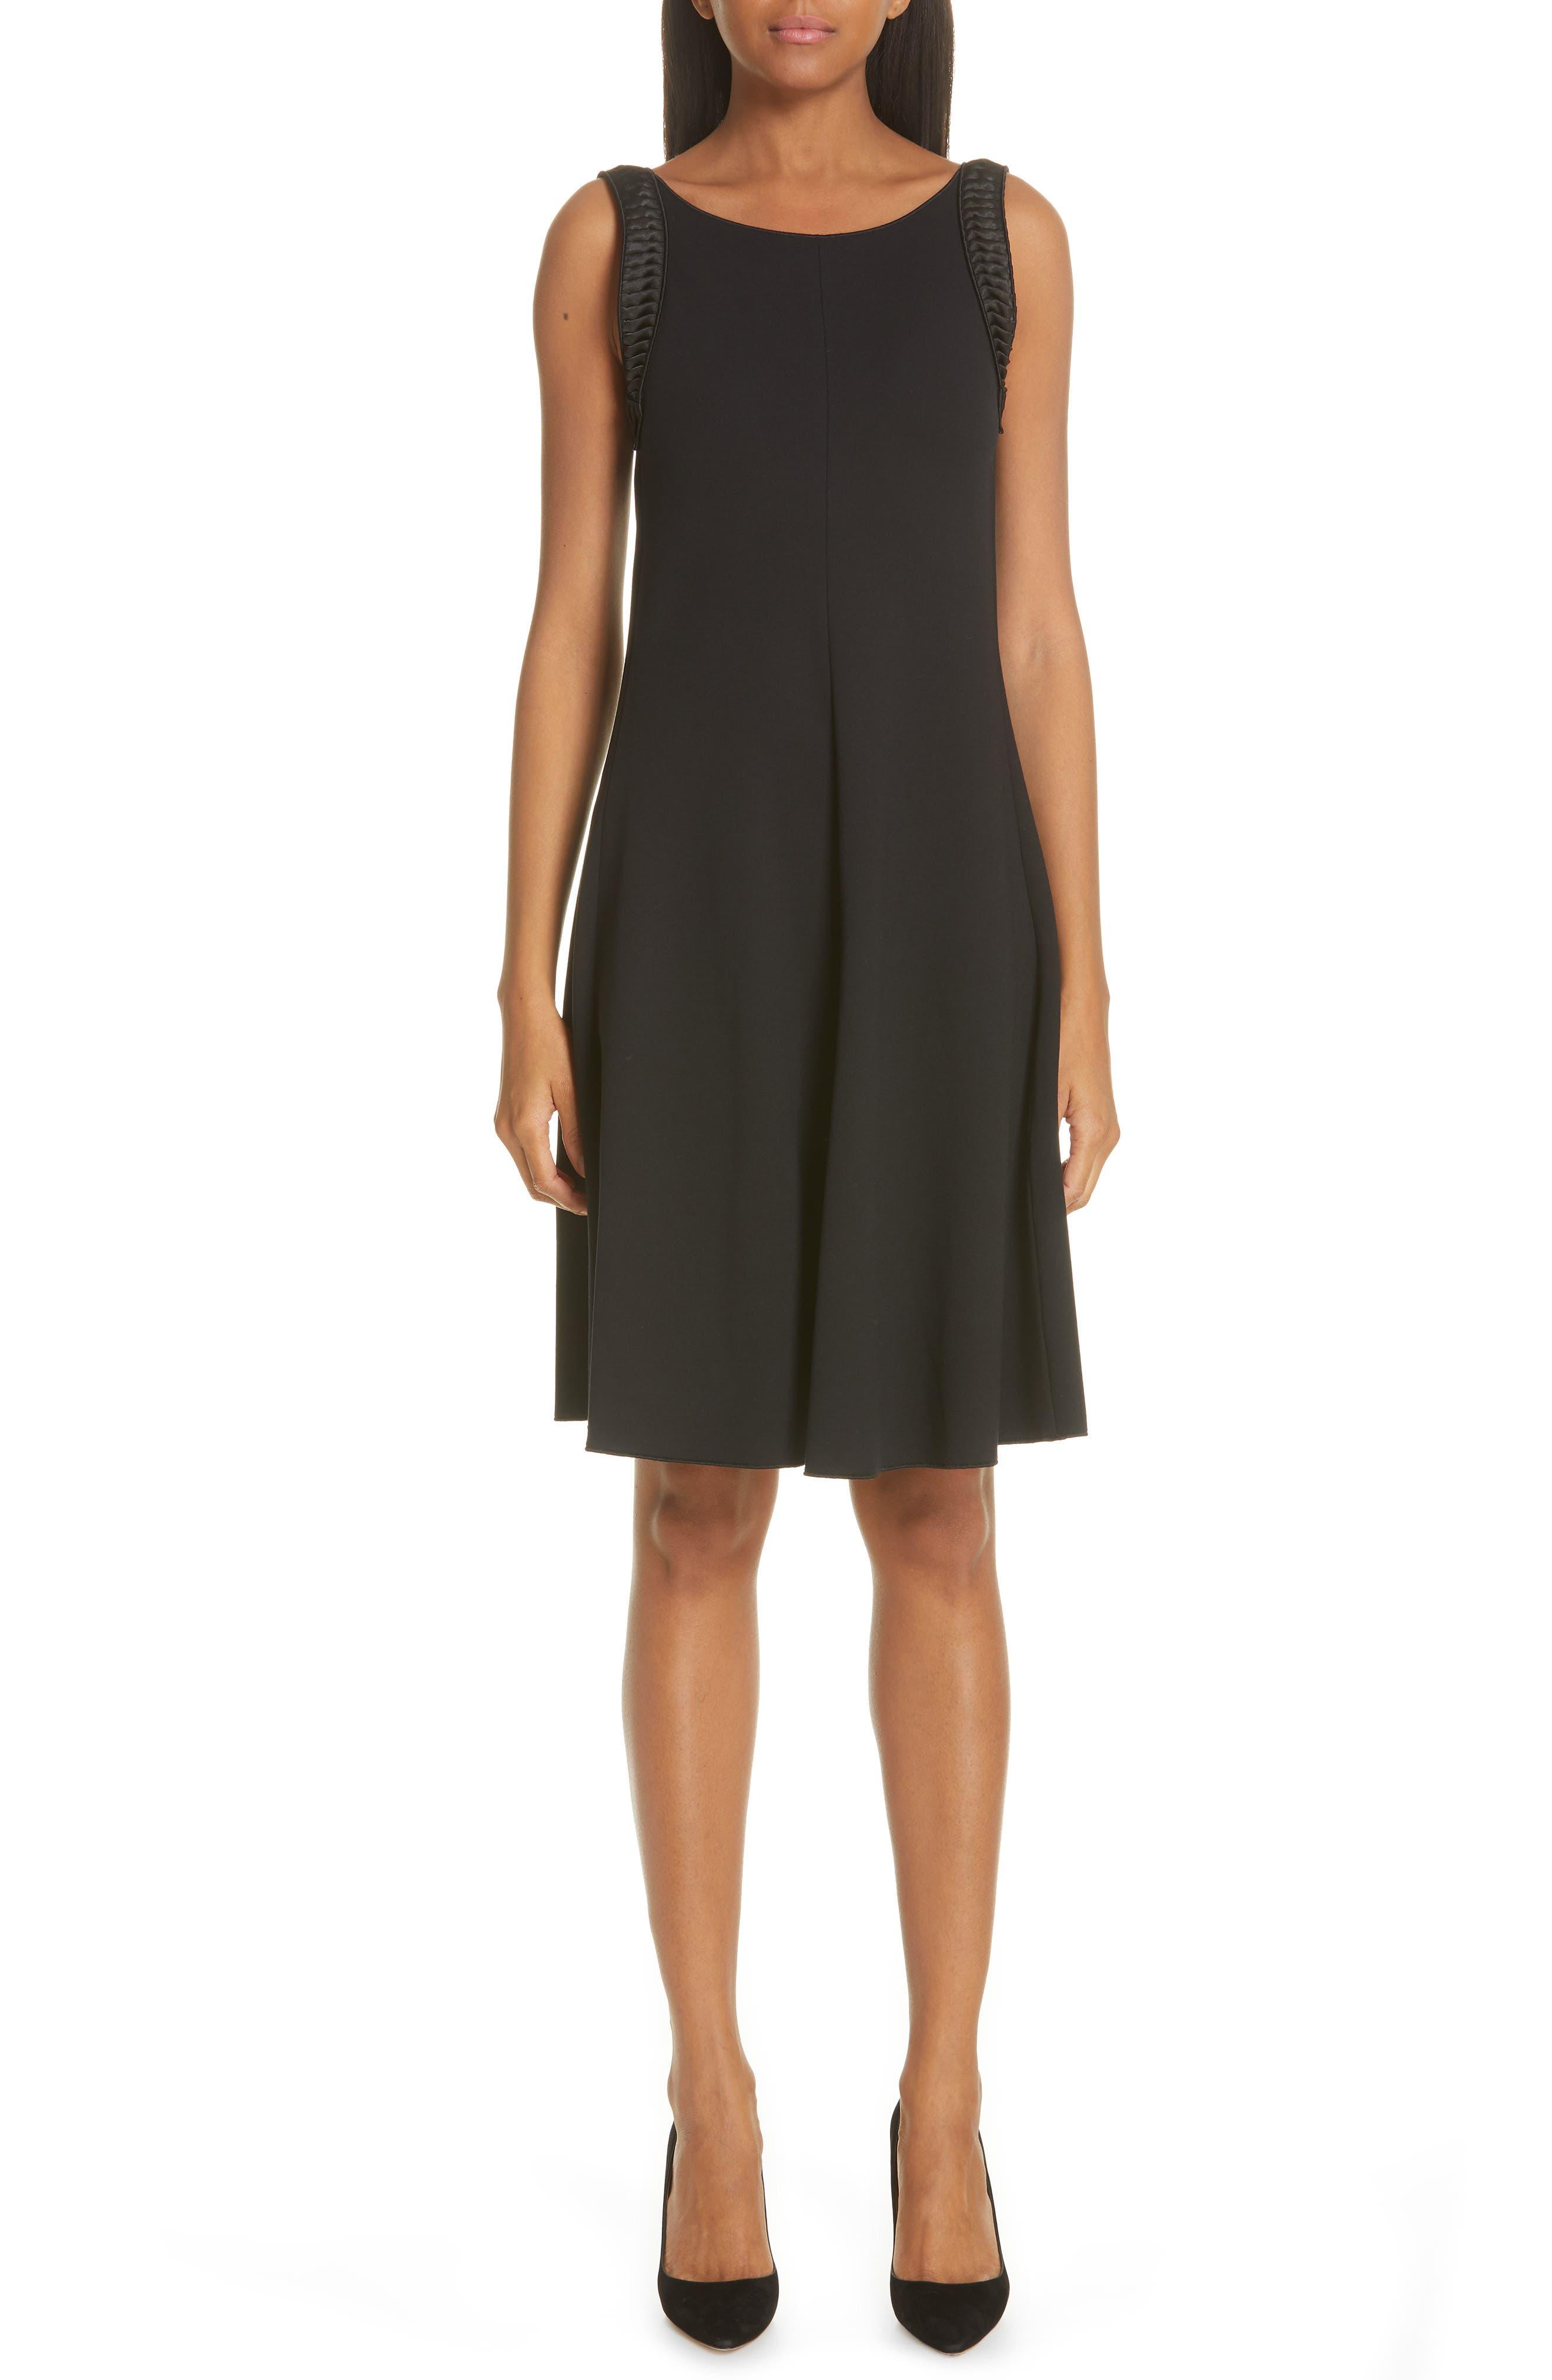 Emporio Armani Stretch Jacquard Dress, US / 44 IT - Black